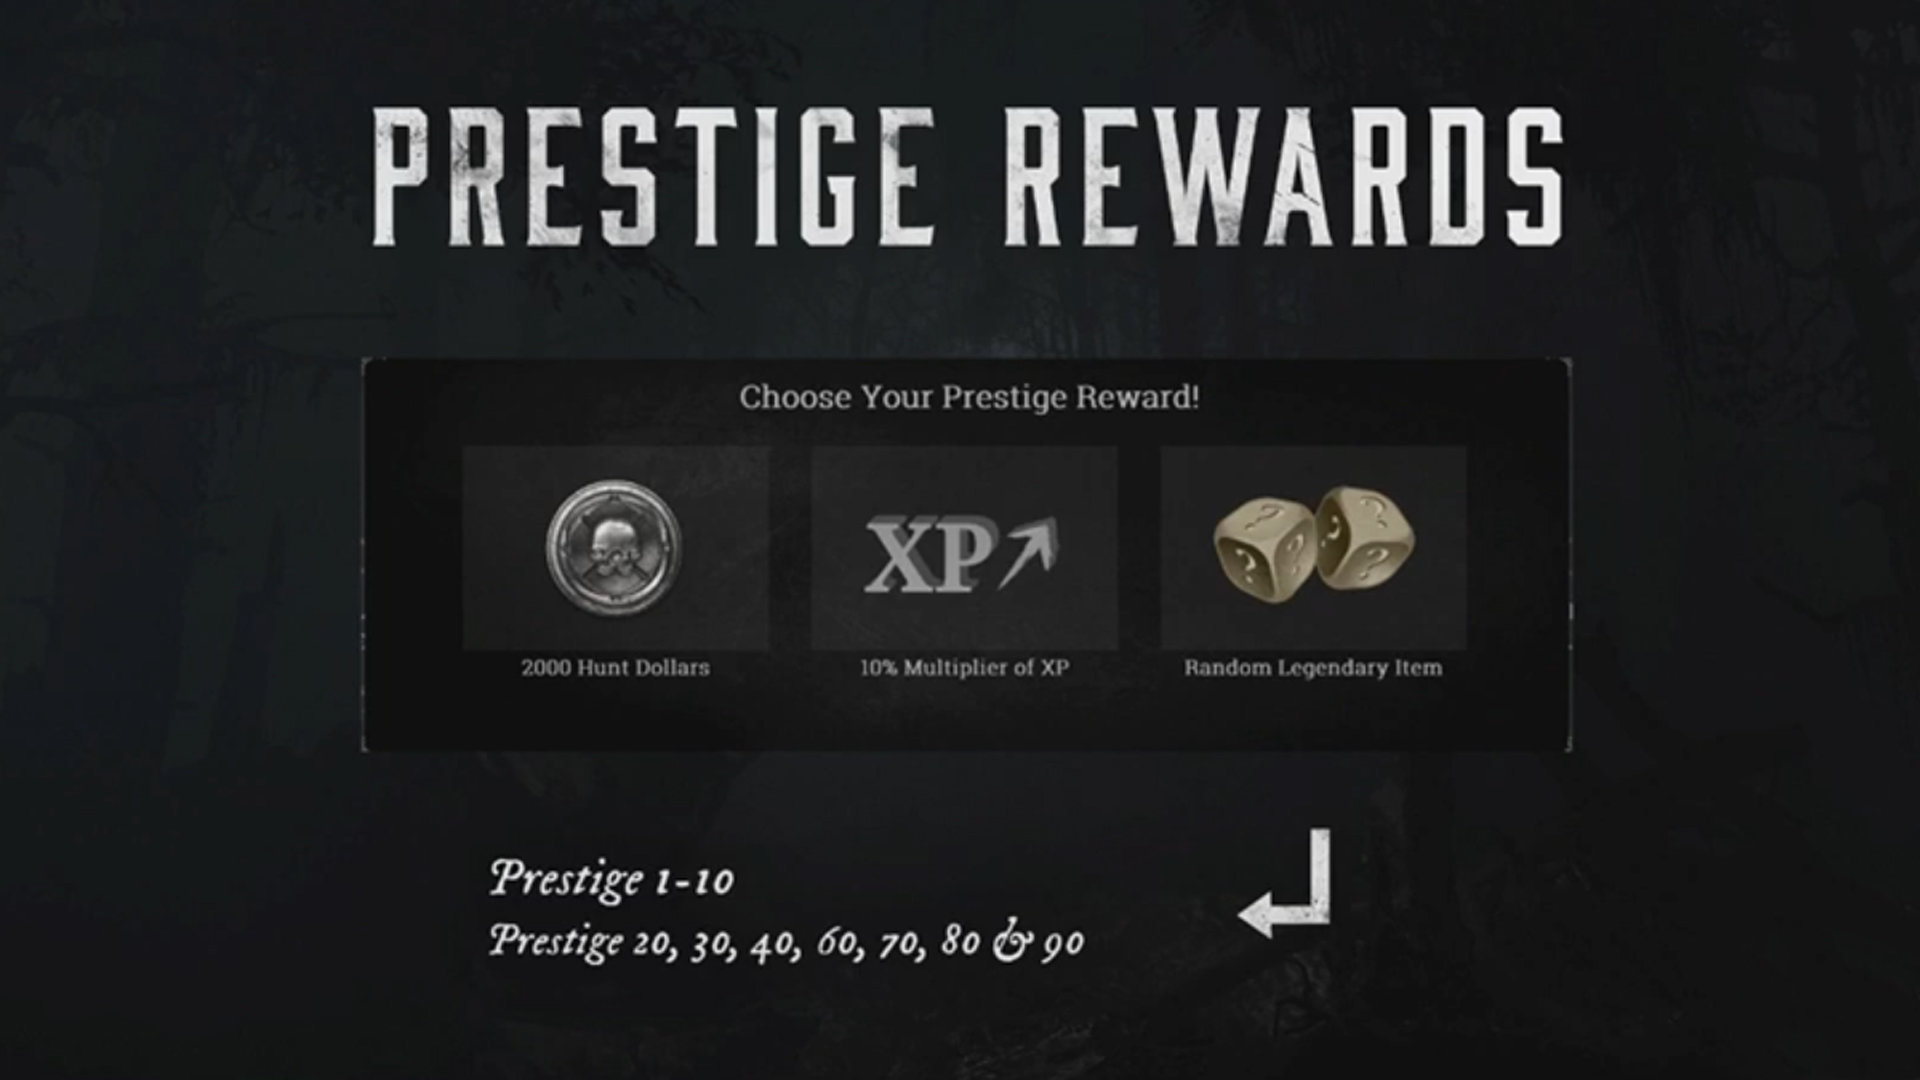 prestigerewards.jpg.de222c75dd4f59d8918dcaec40bdc731.jpg